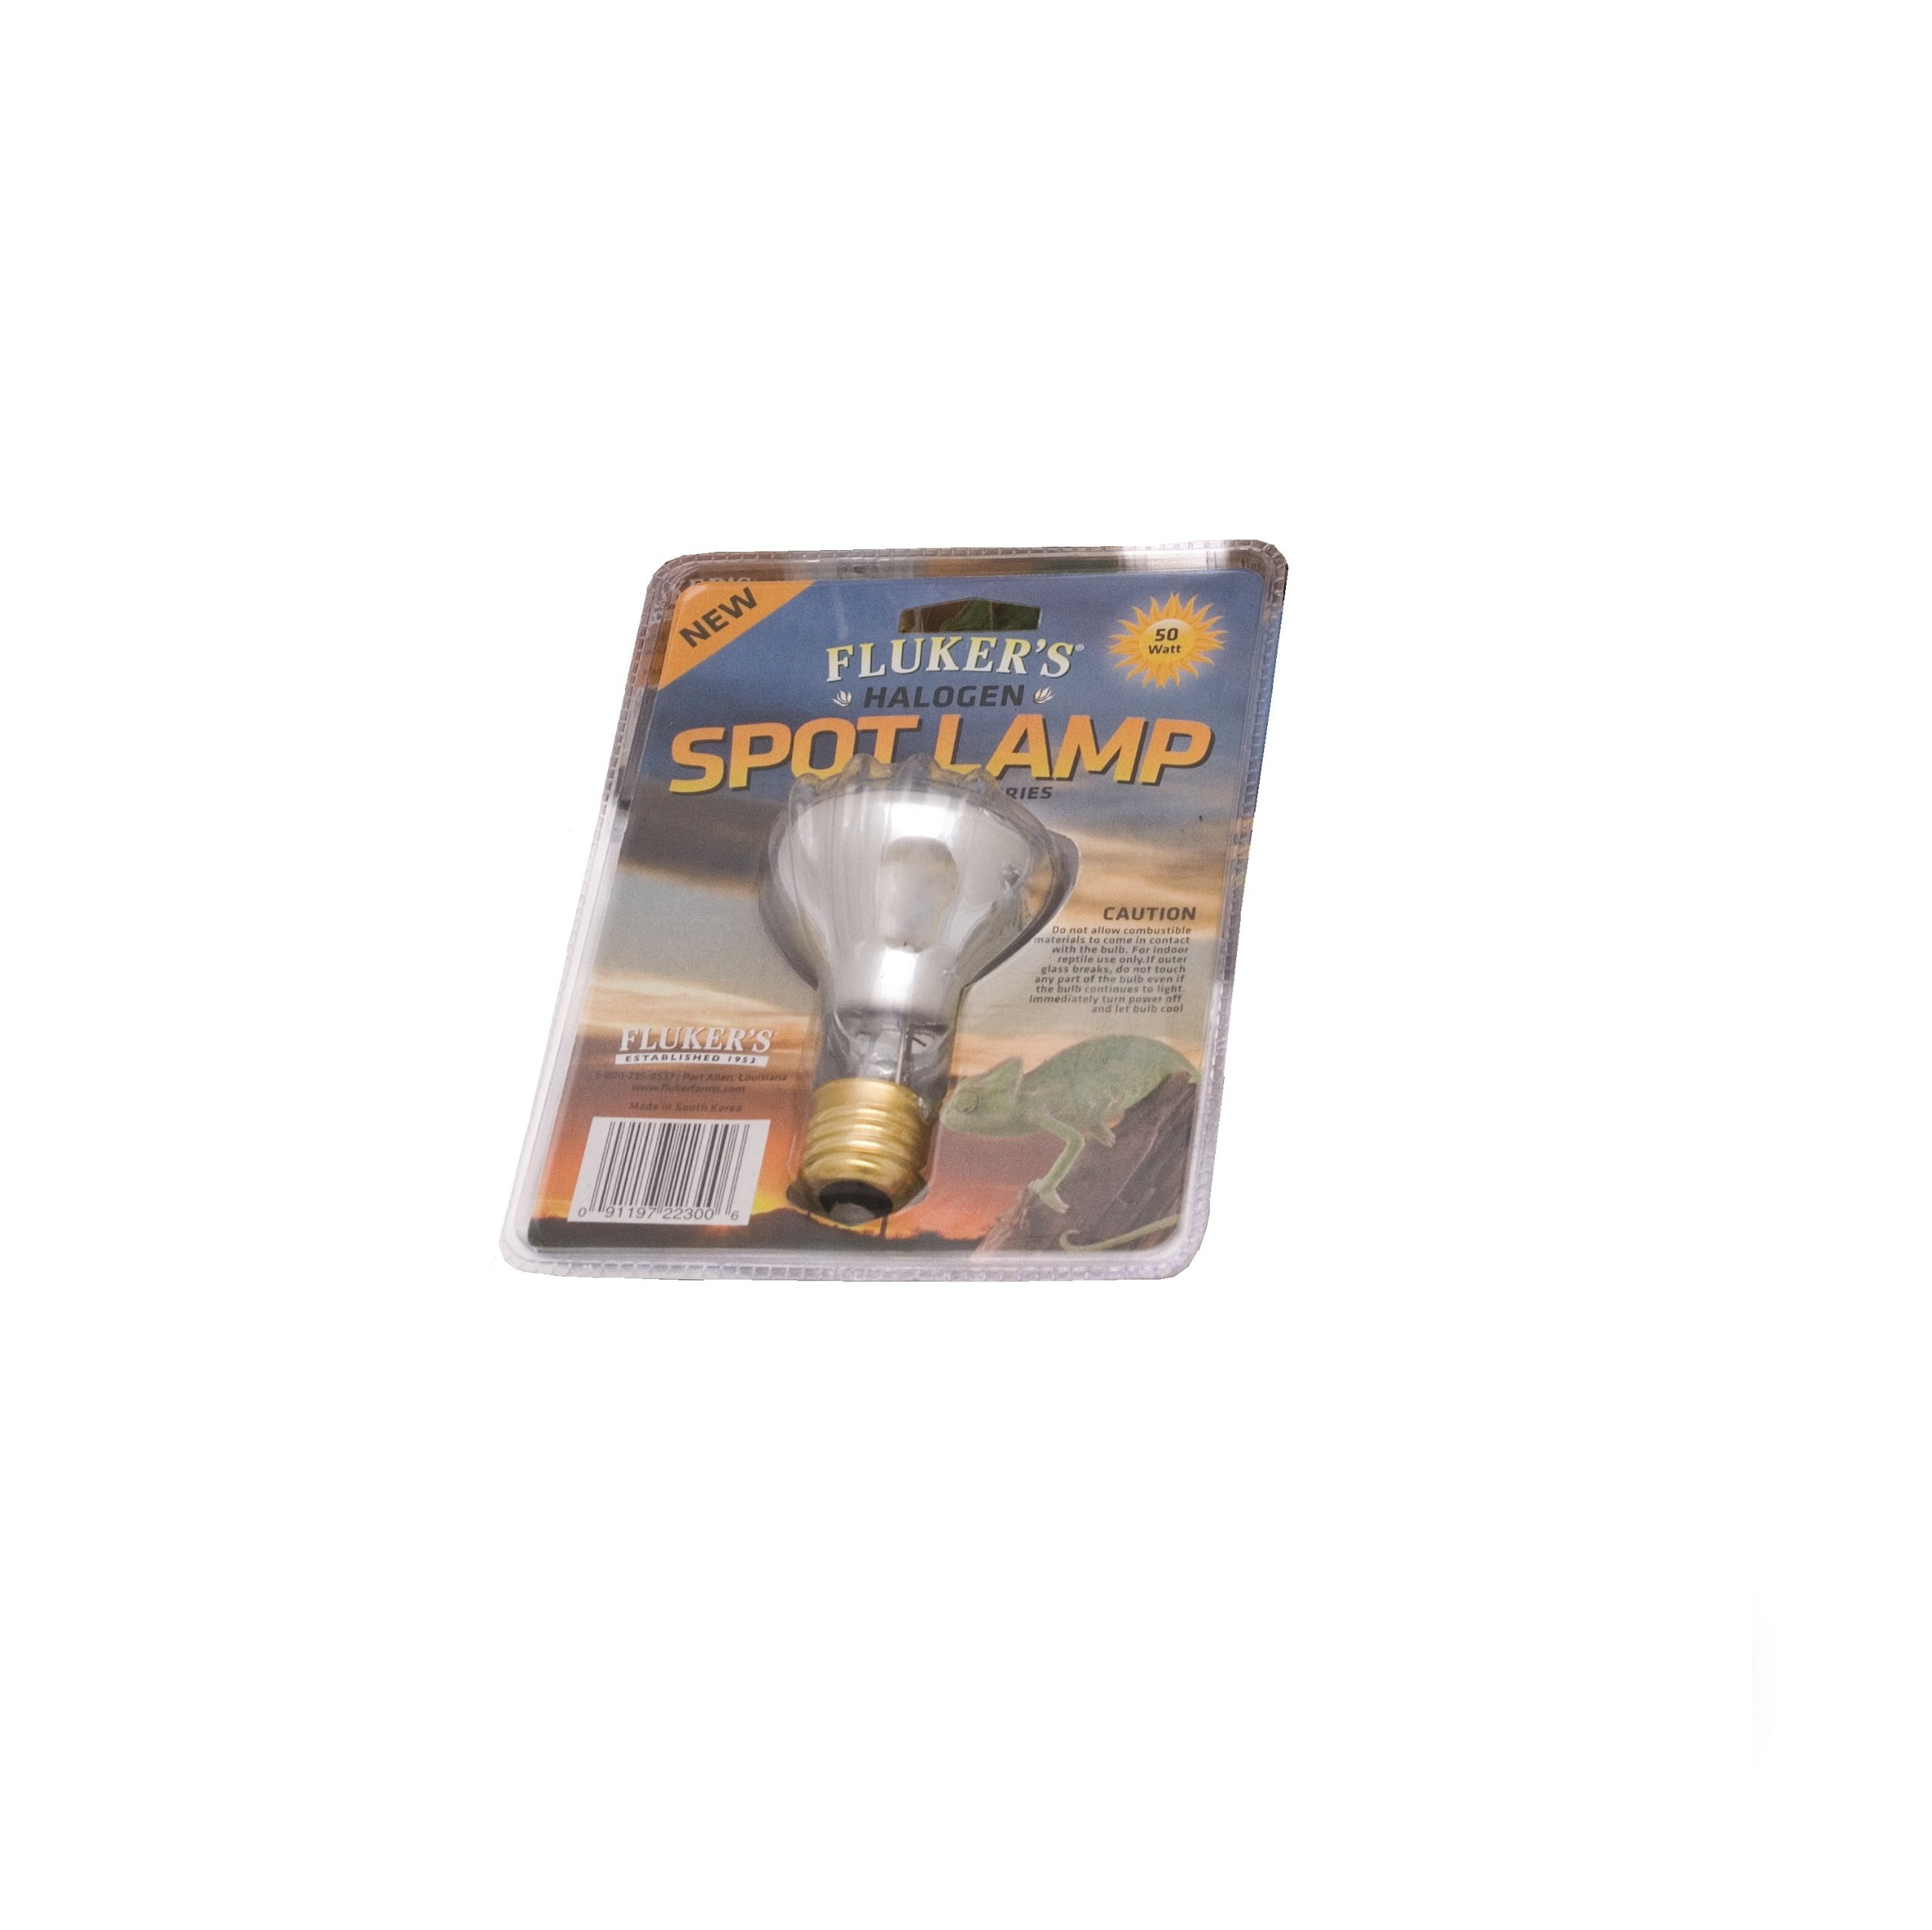 Fluker's Professional Series Reptile Halogen Spot Lamp, 75 Watt